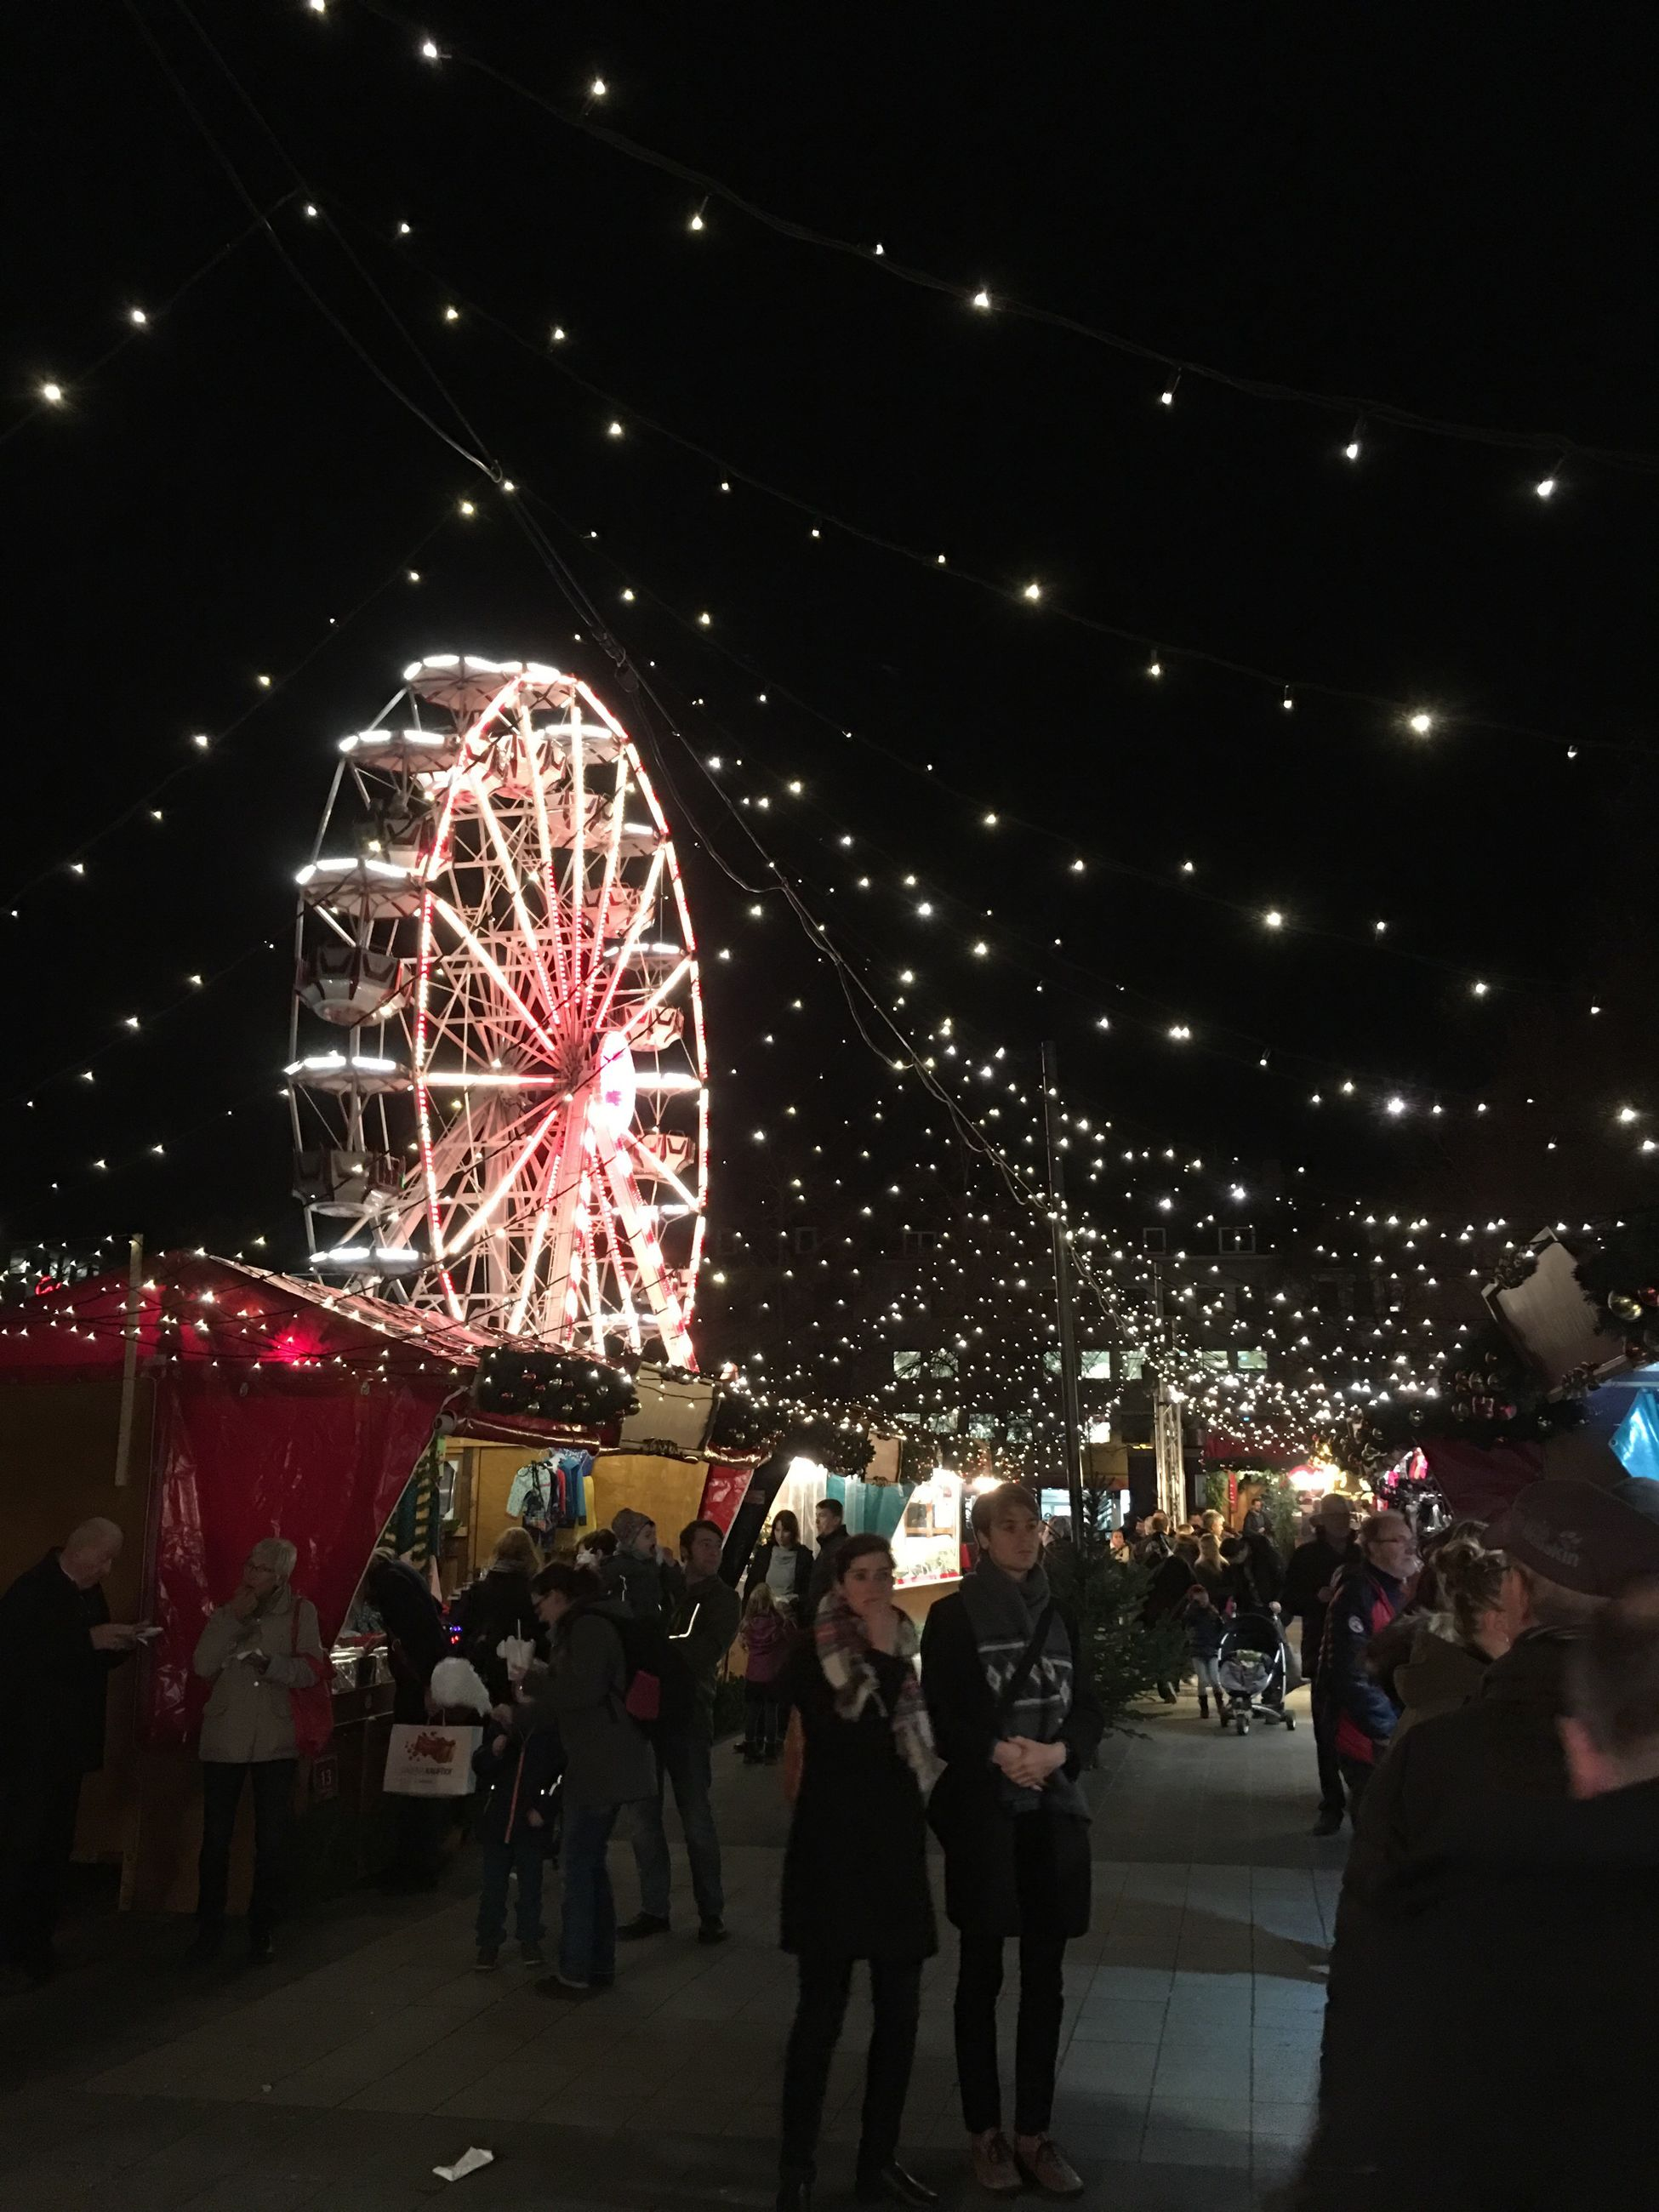 night, illuminated, ferris wheel, sky, firework display, people, celebration, motion, large group of people, firework - man made object, outdoors, midnight, adult